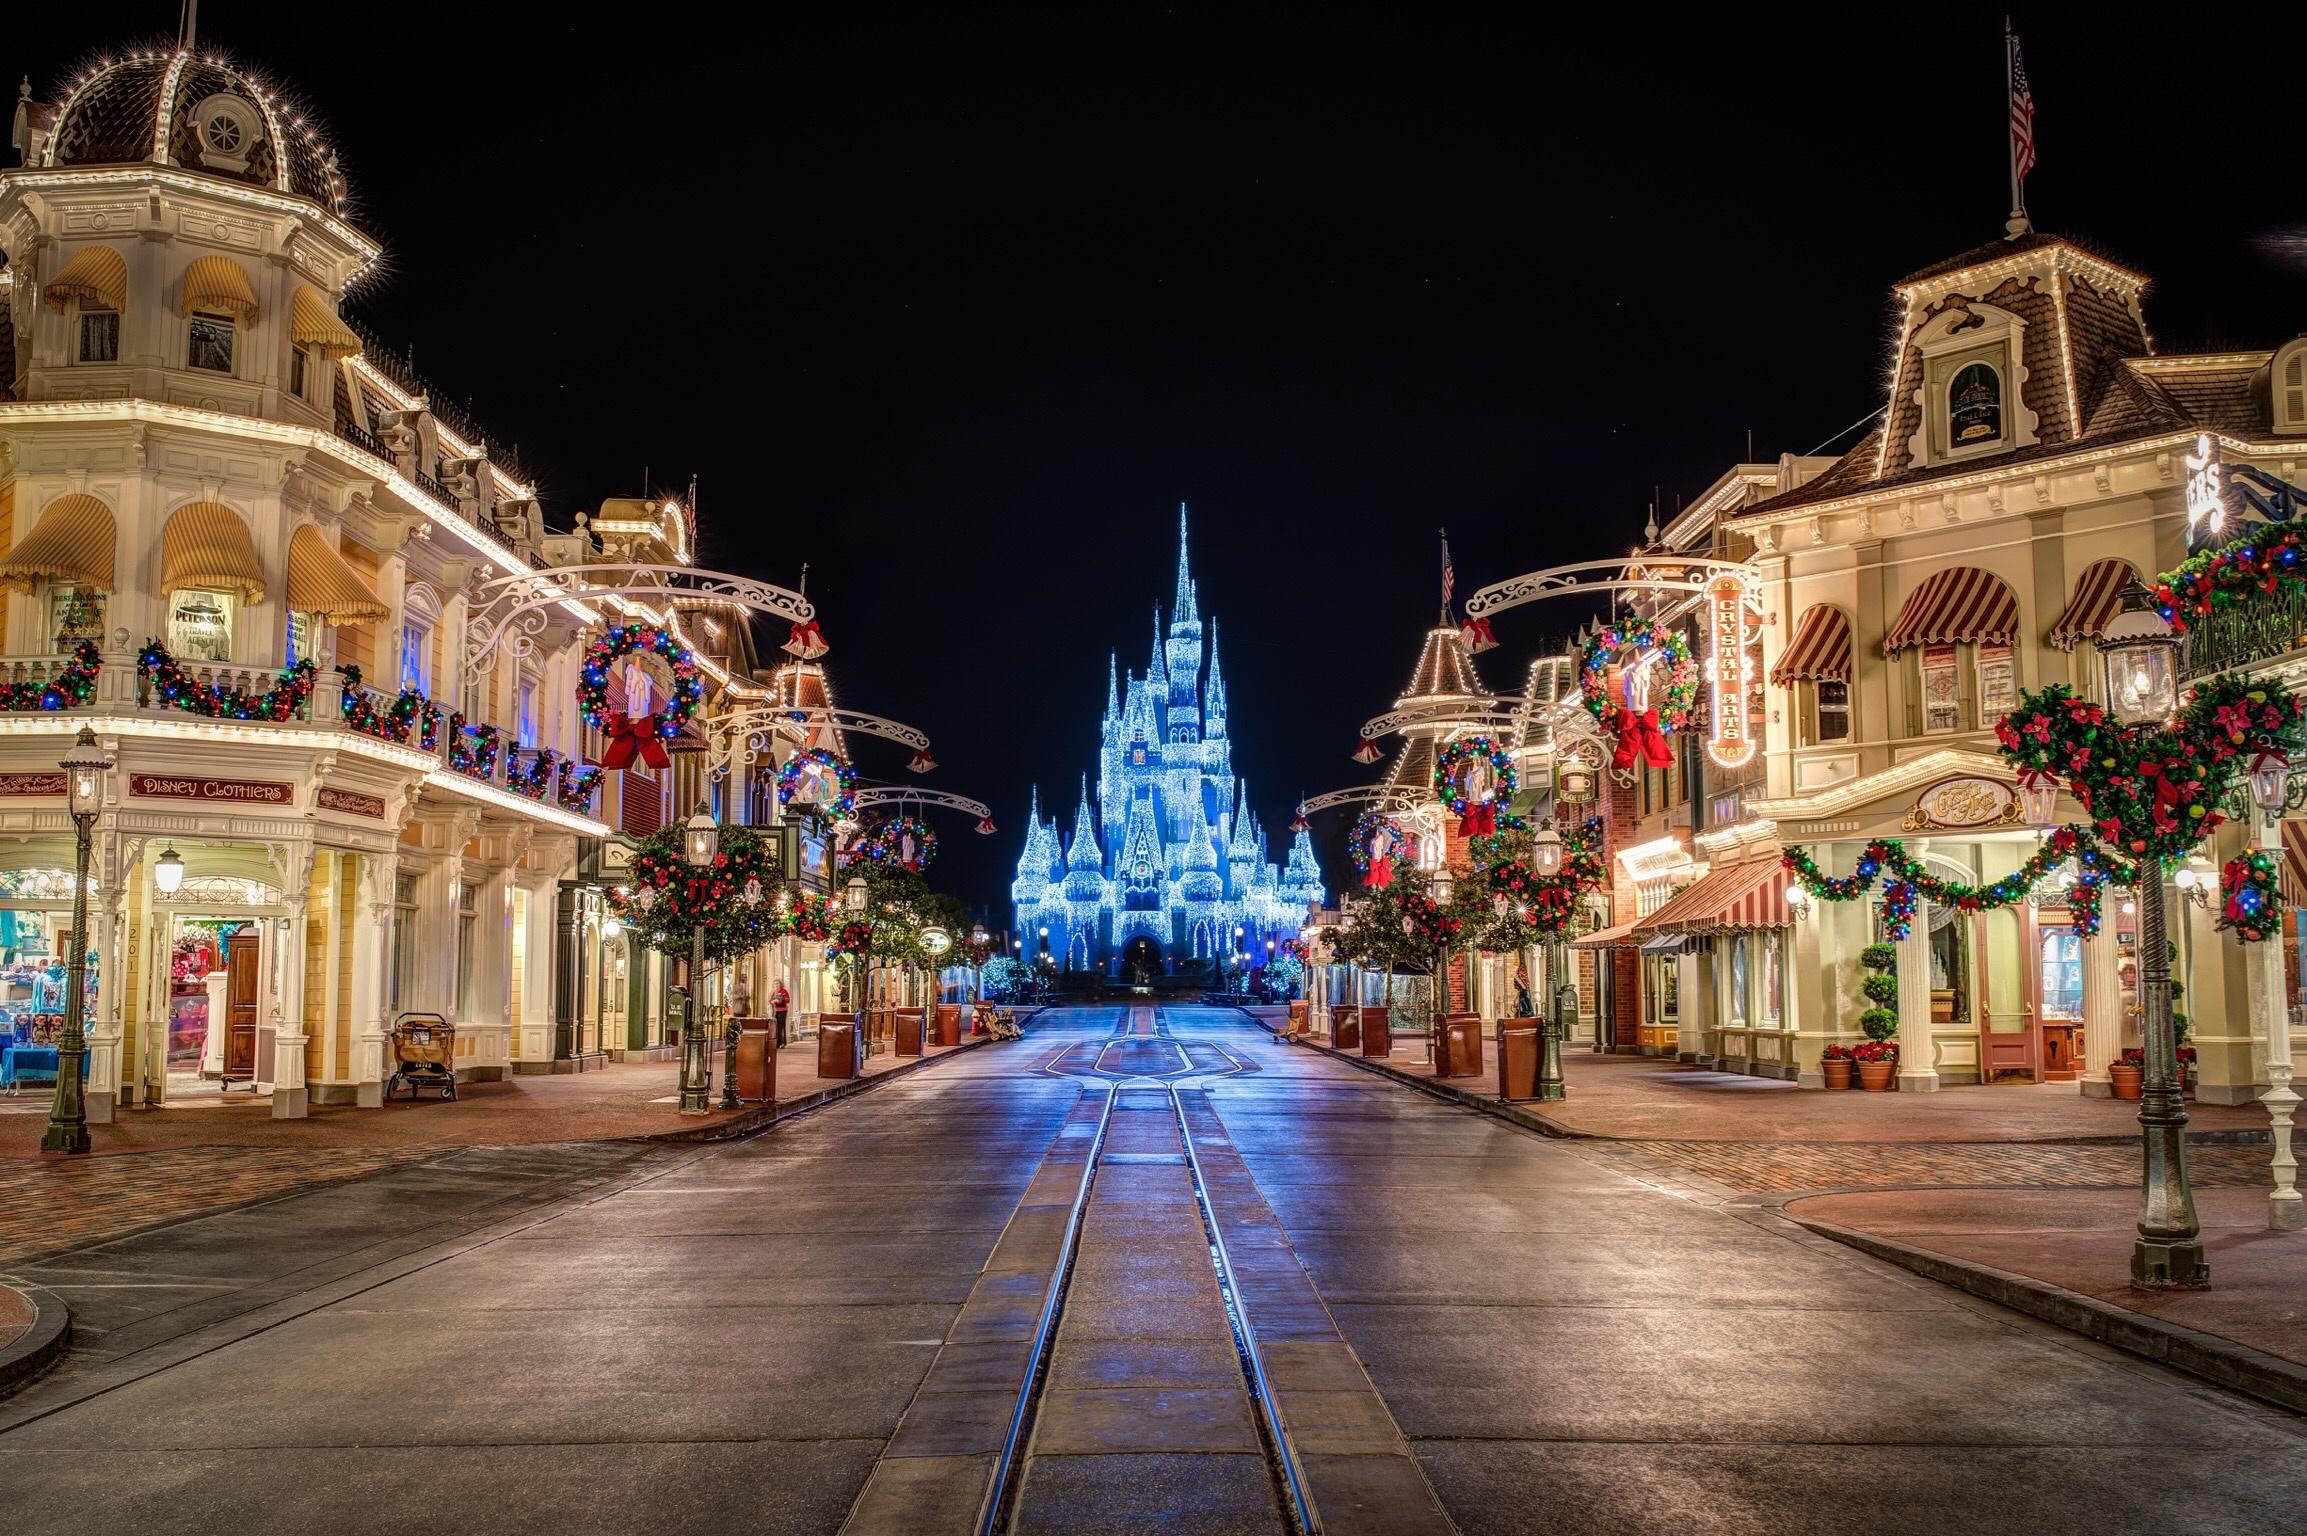 cityscape night town Christmas christmas lights landmark sigma christmas decoration place of worship waltdisneyworld magickingdom wdw mefoto blackrapid mainstreetusa cinderellacastle dreamlights 724888